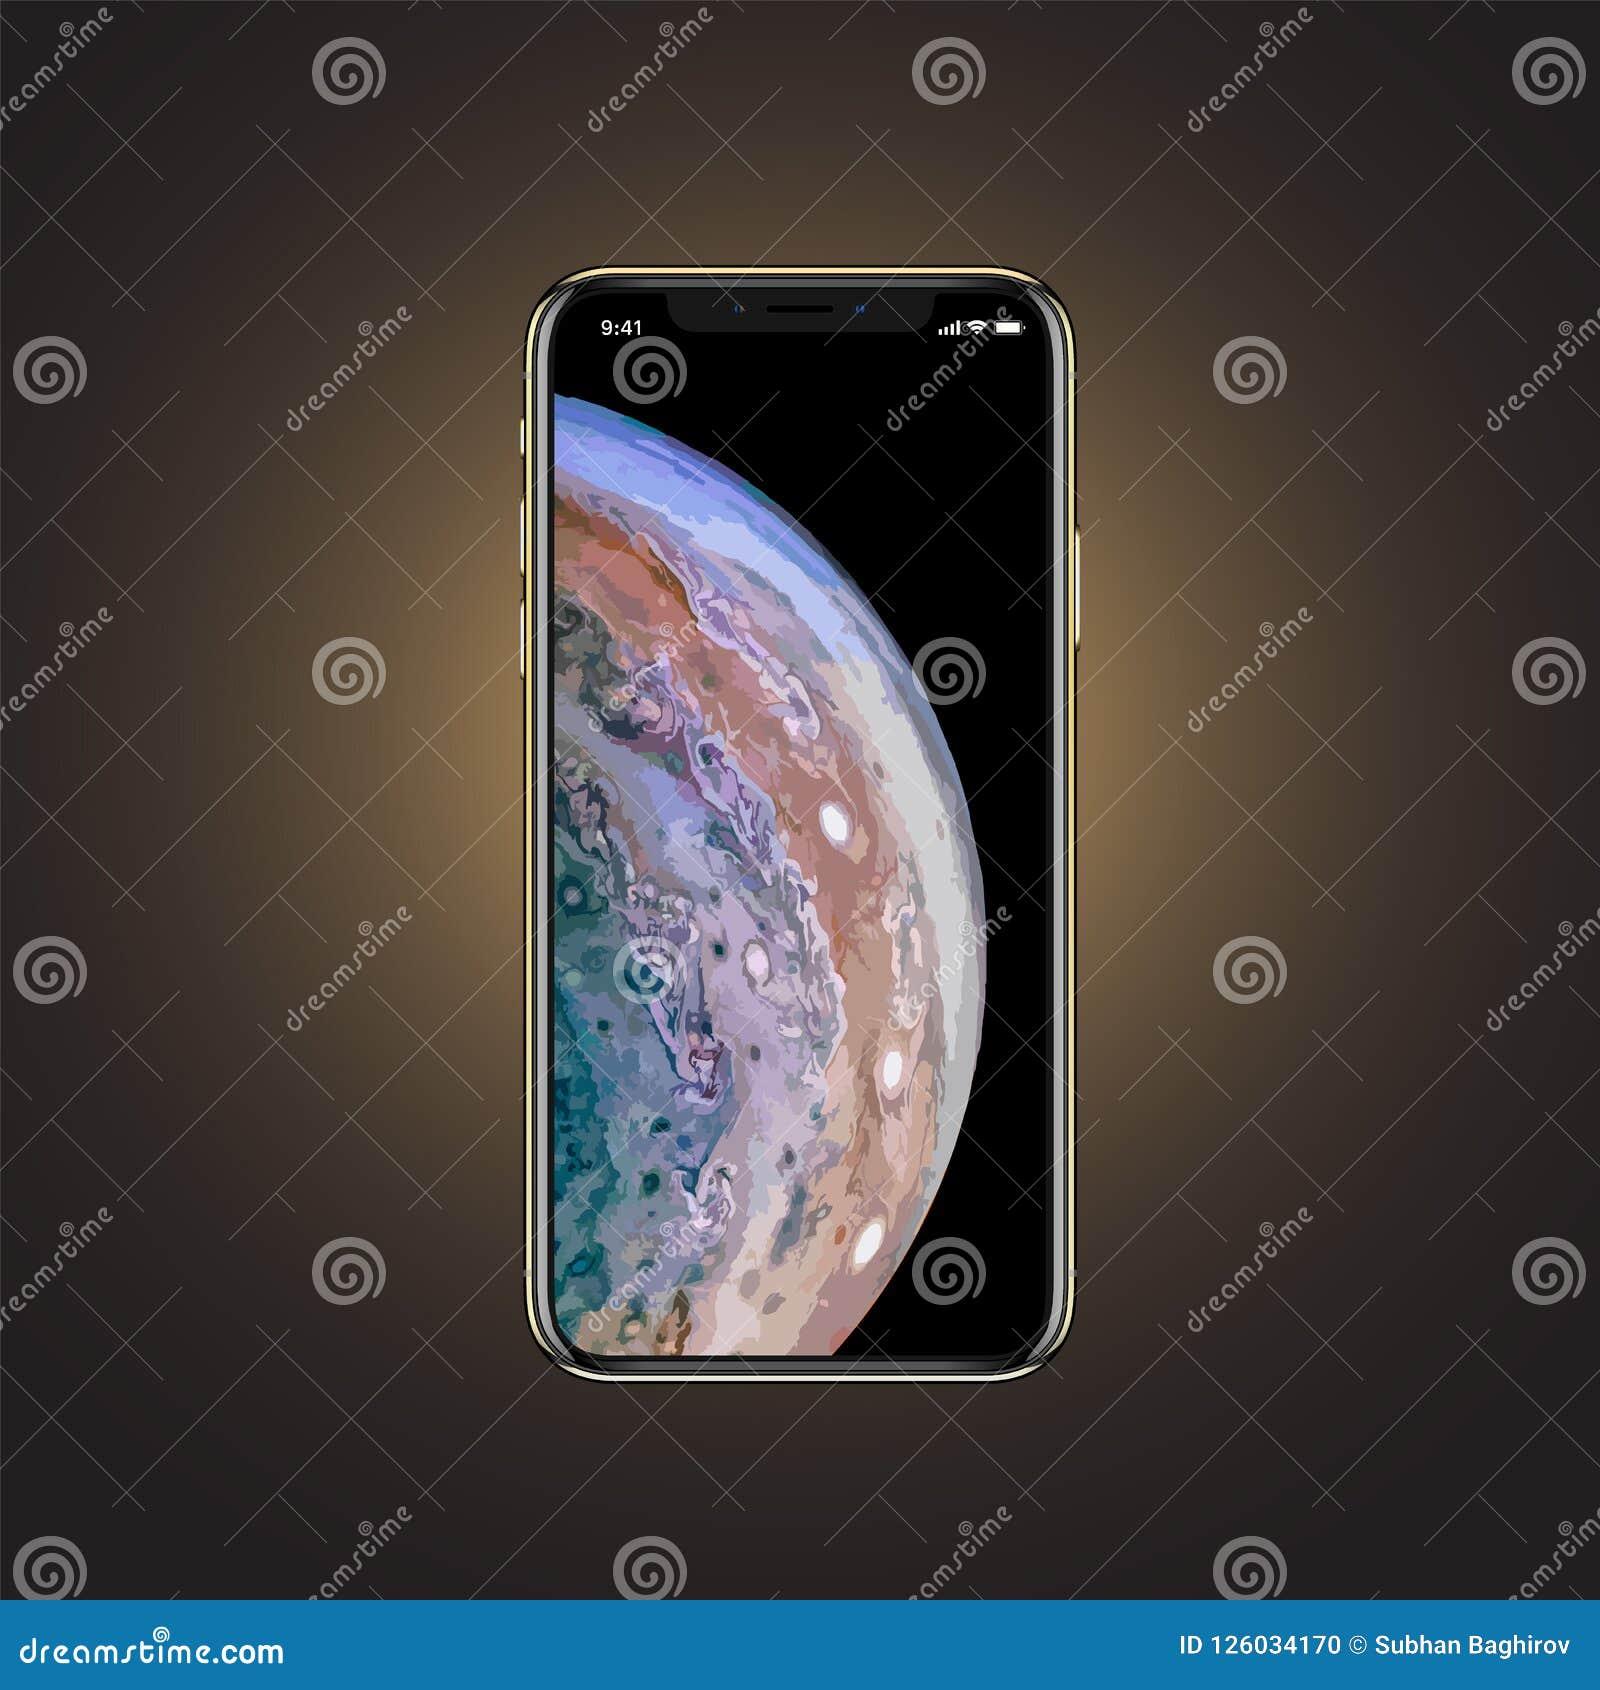 Baku, Azerbaijan - September 12, 2018: iPhone X S isolated on gold background